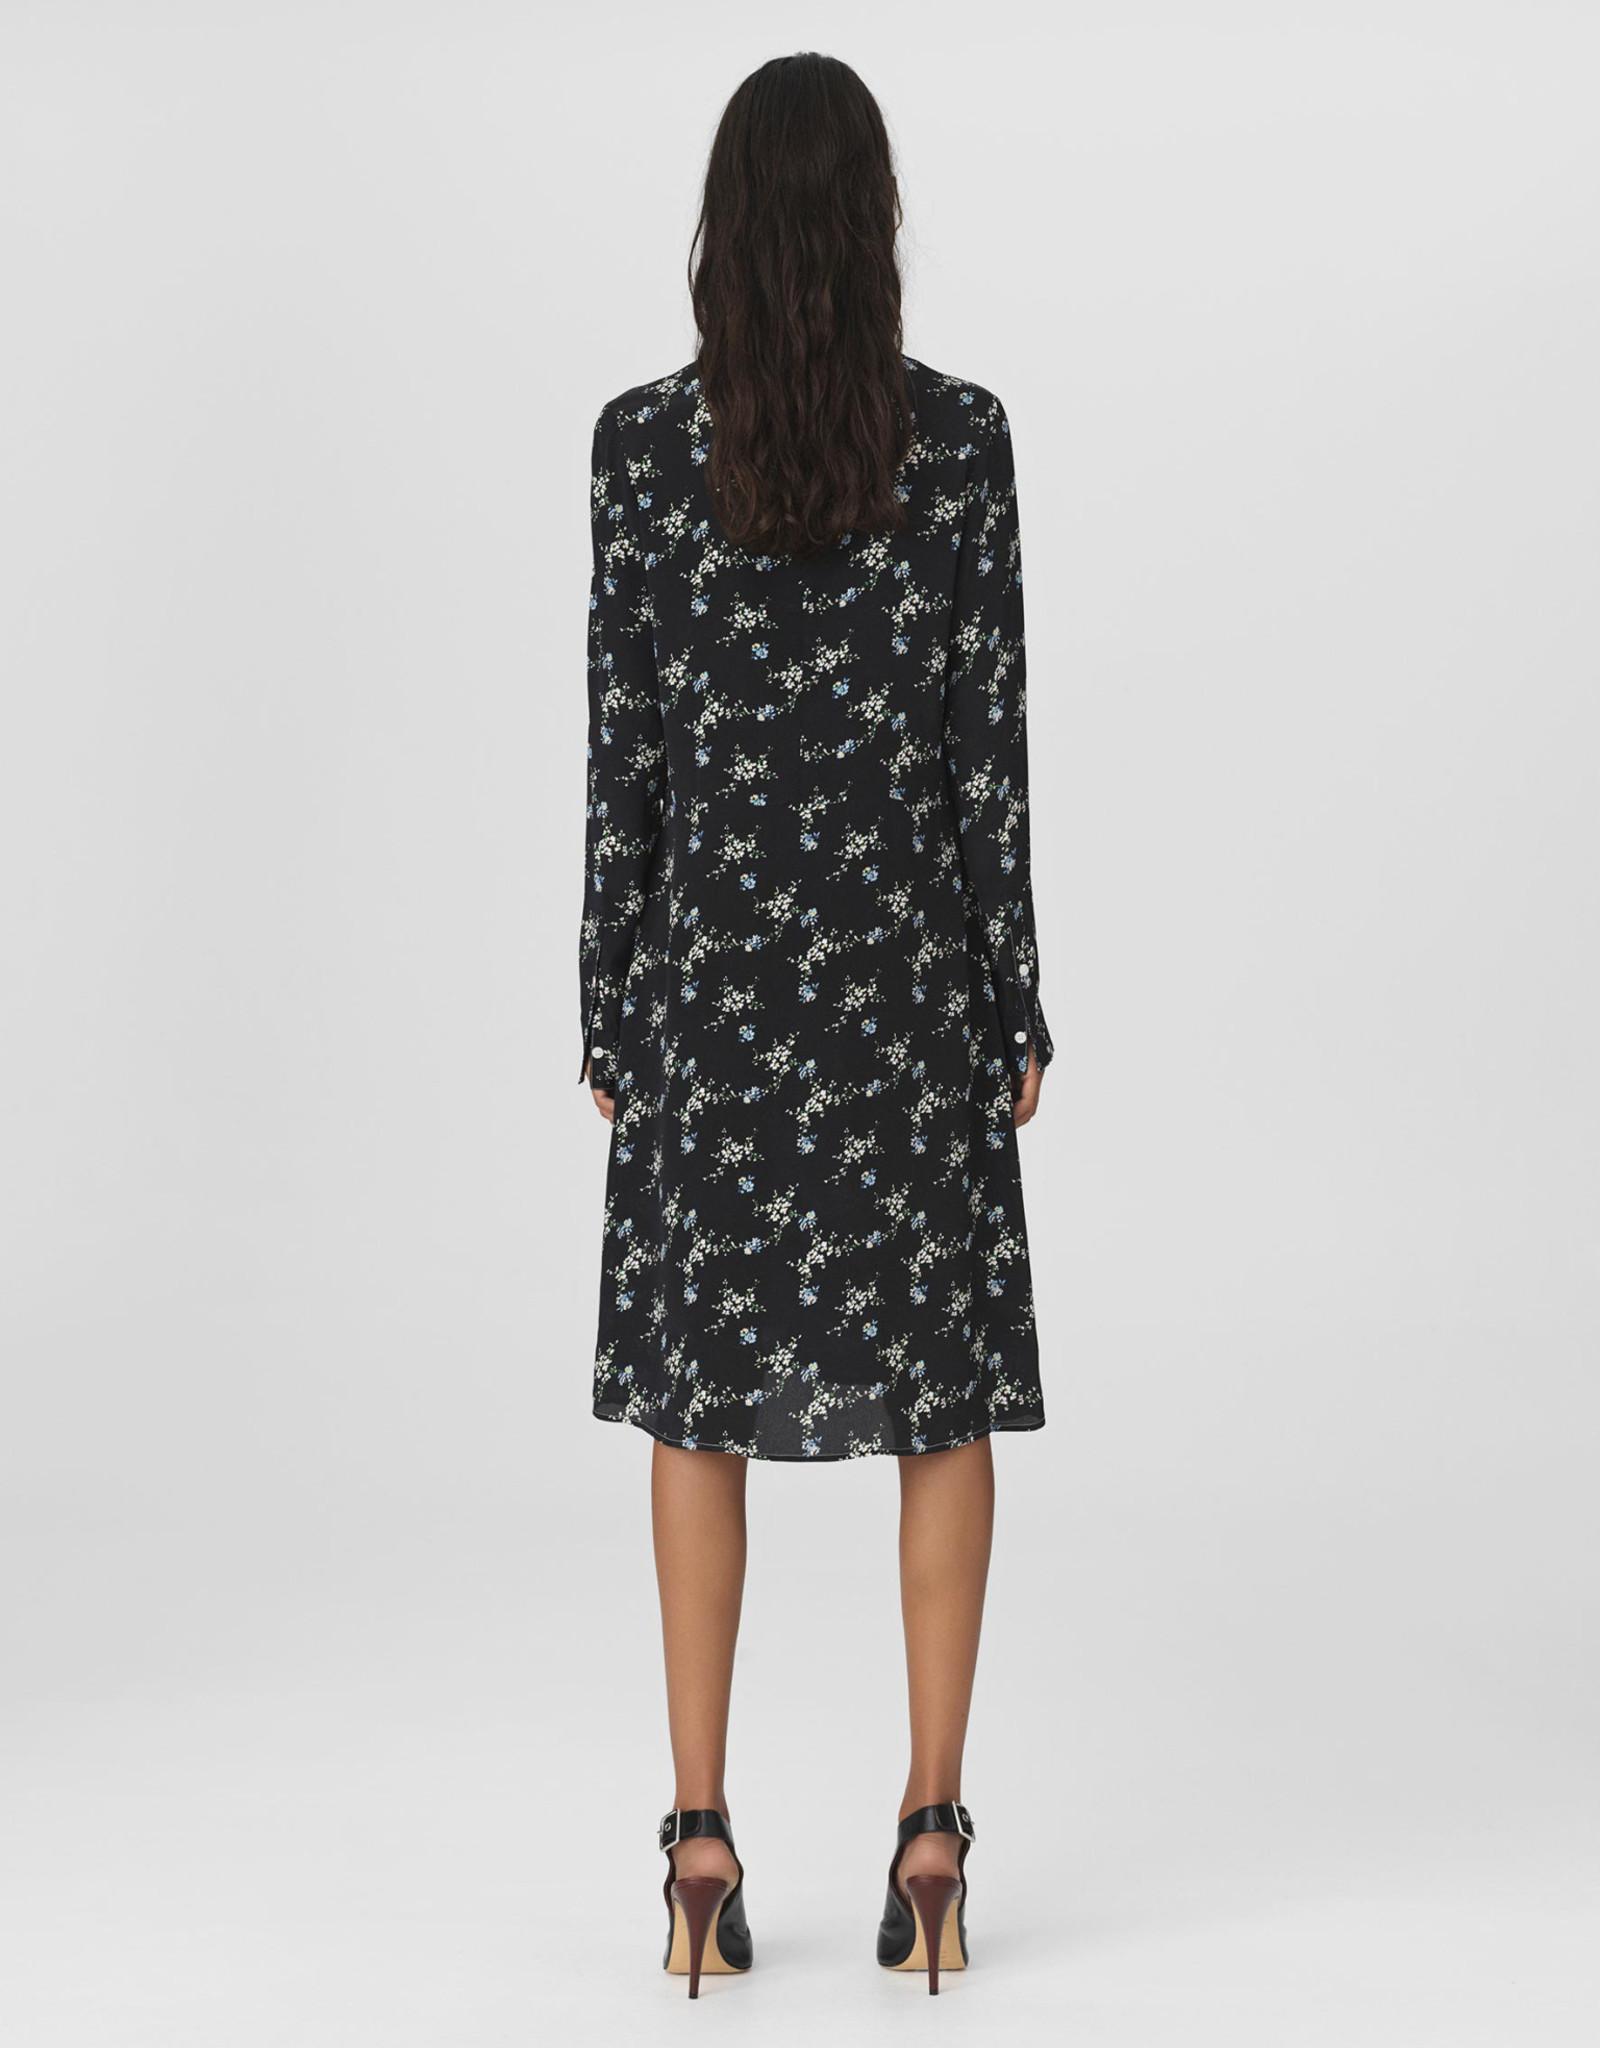 BY MALENE BIRGER The Garola Dress